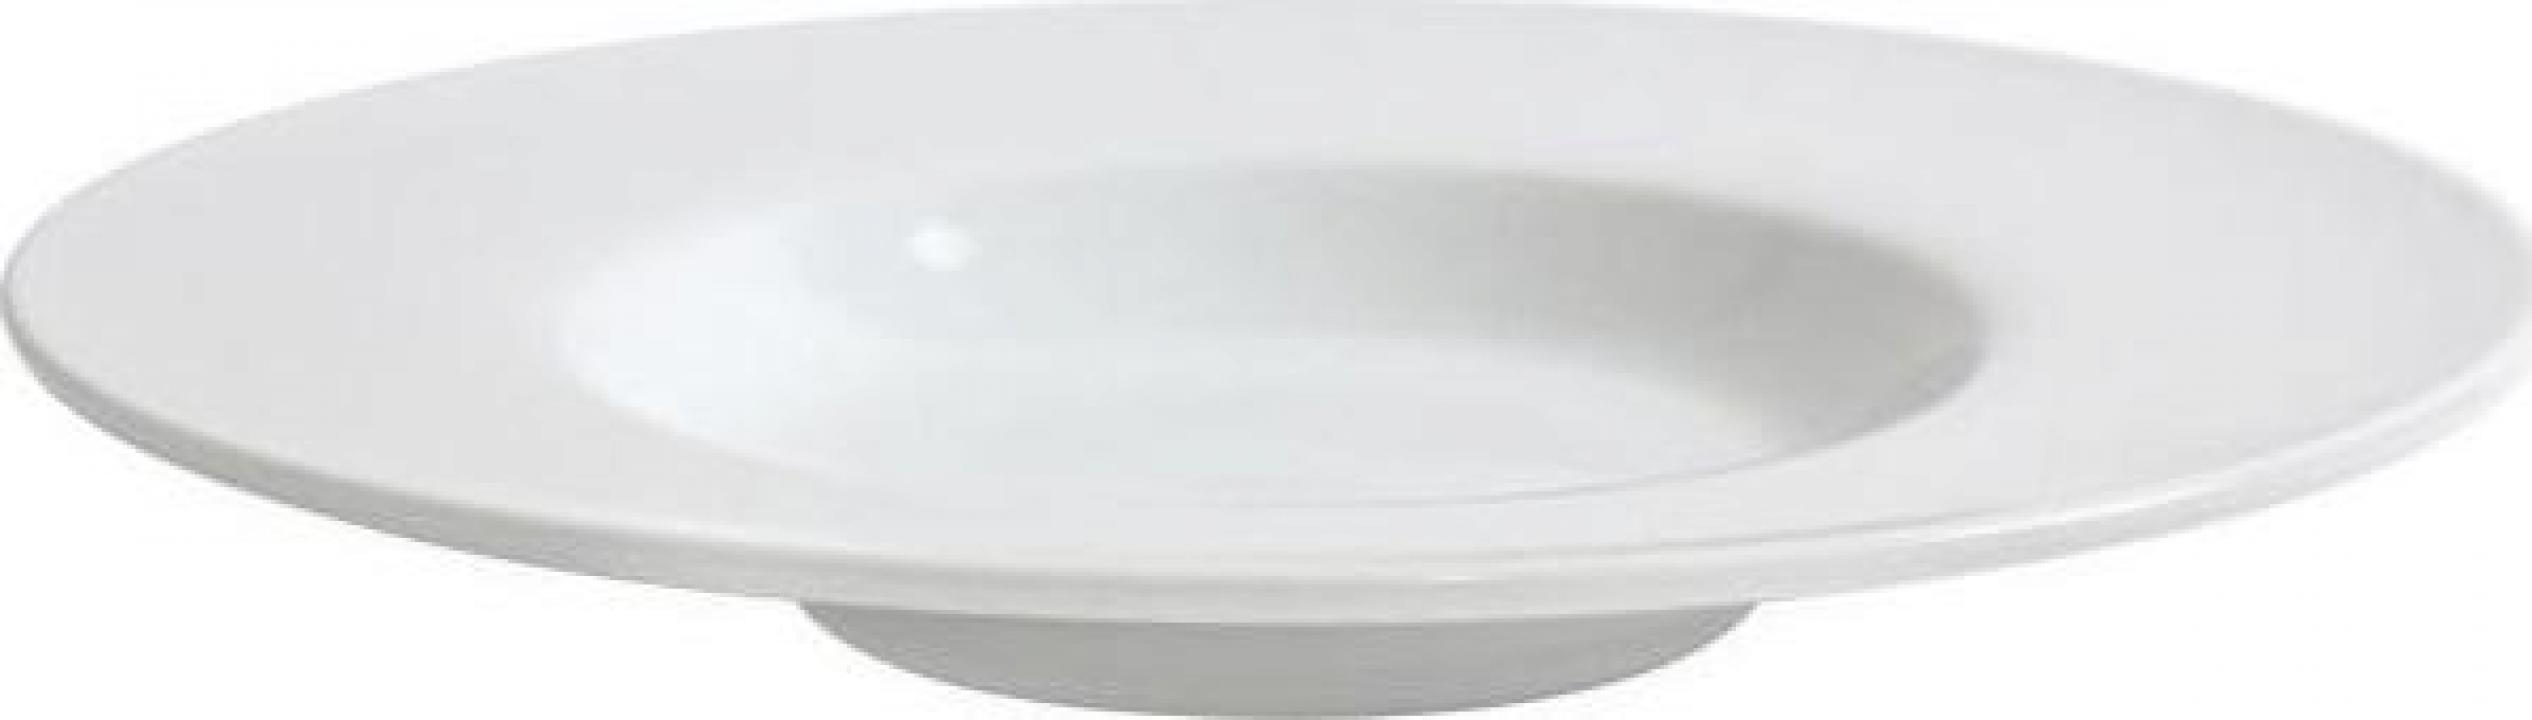 Farfurie risotto 31 cm